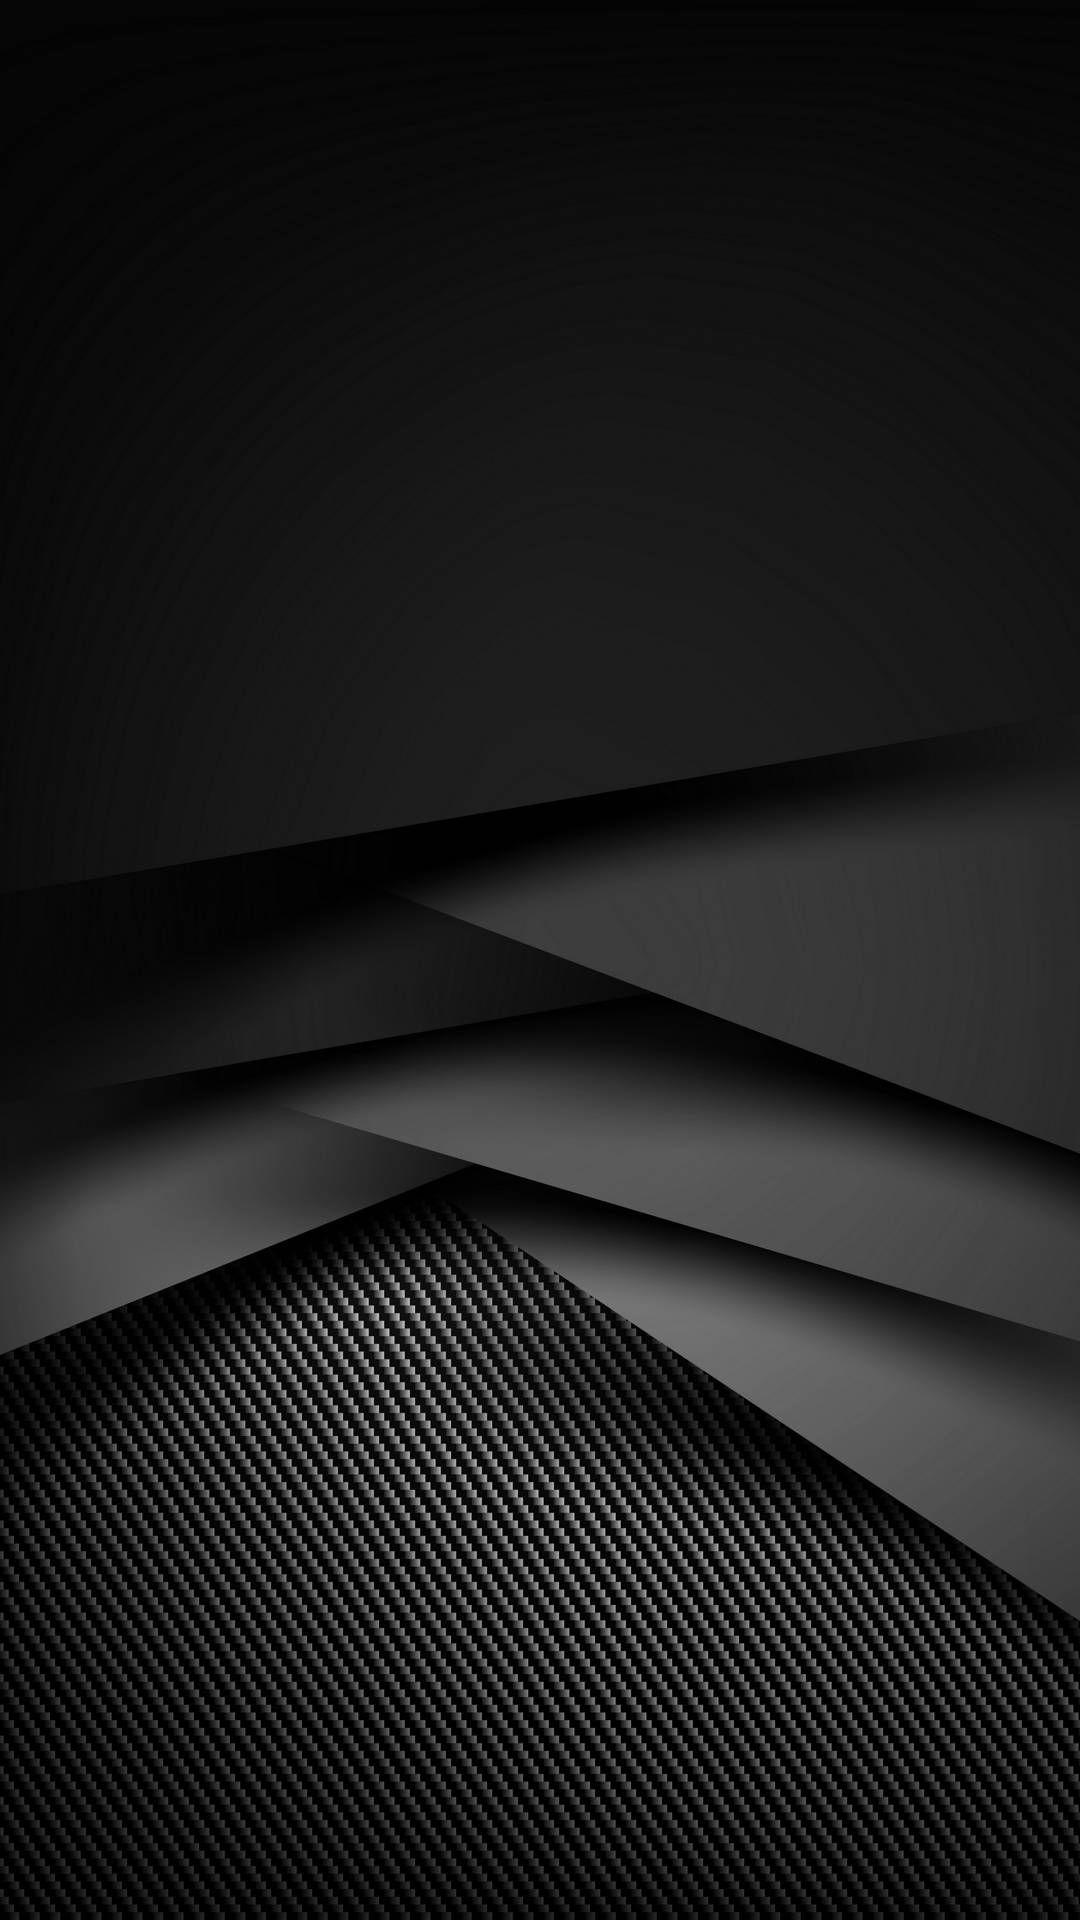 Muchatseble Carbon Wallpaper Black Wallpaper Black Background Wallpaper